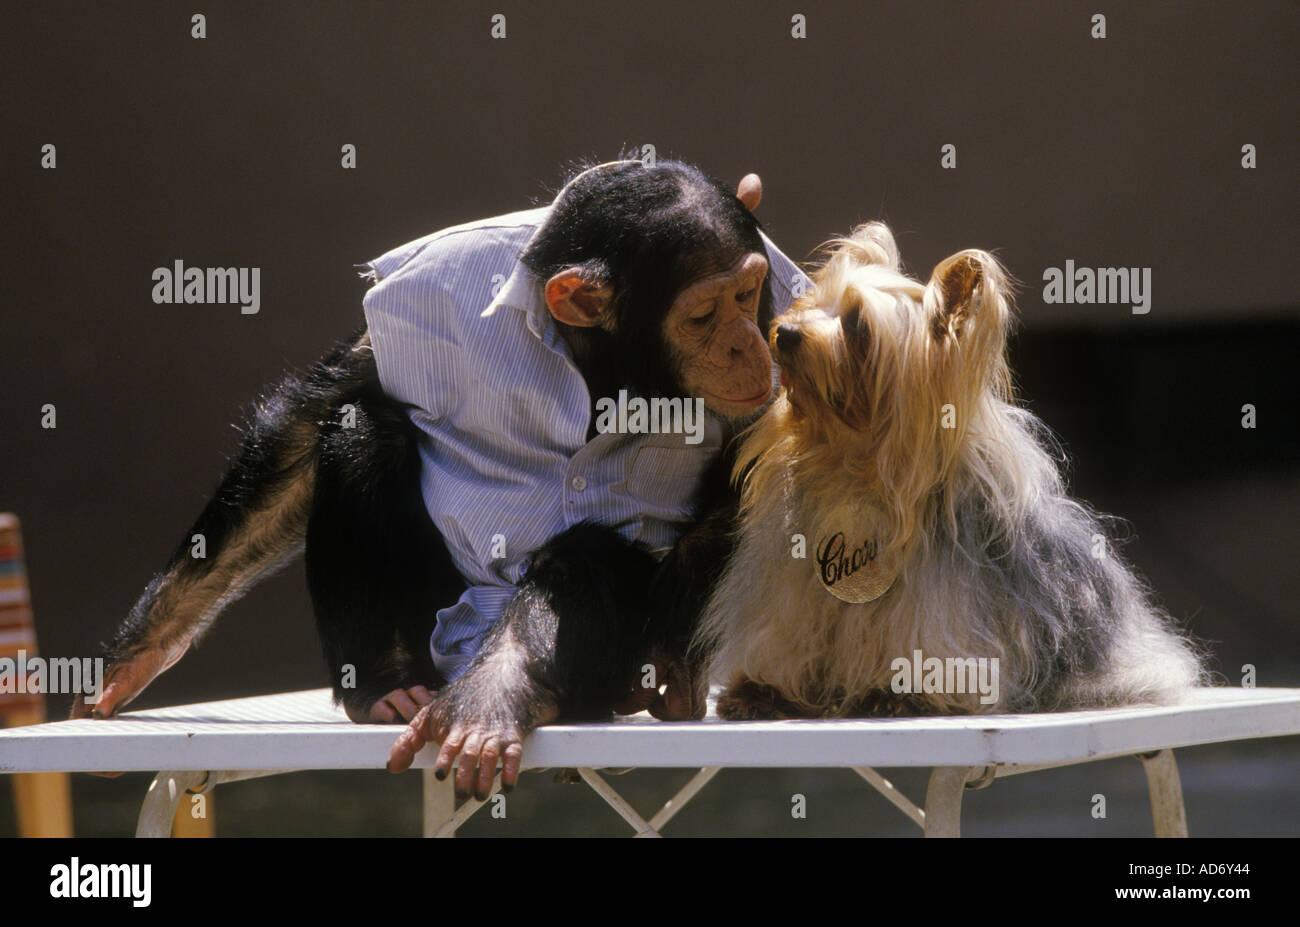 Brook Bond Plateau annonce Rome. L'Italie. Sally chimpanzés plus chien 1988 HOMER SYKES Photo Stock